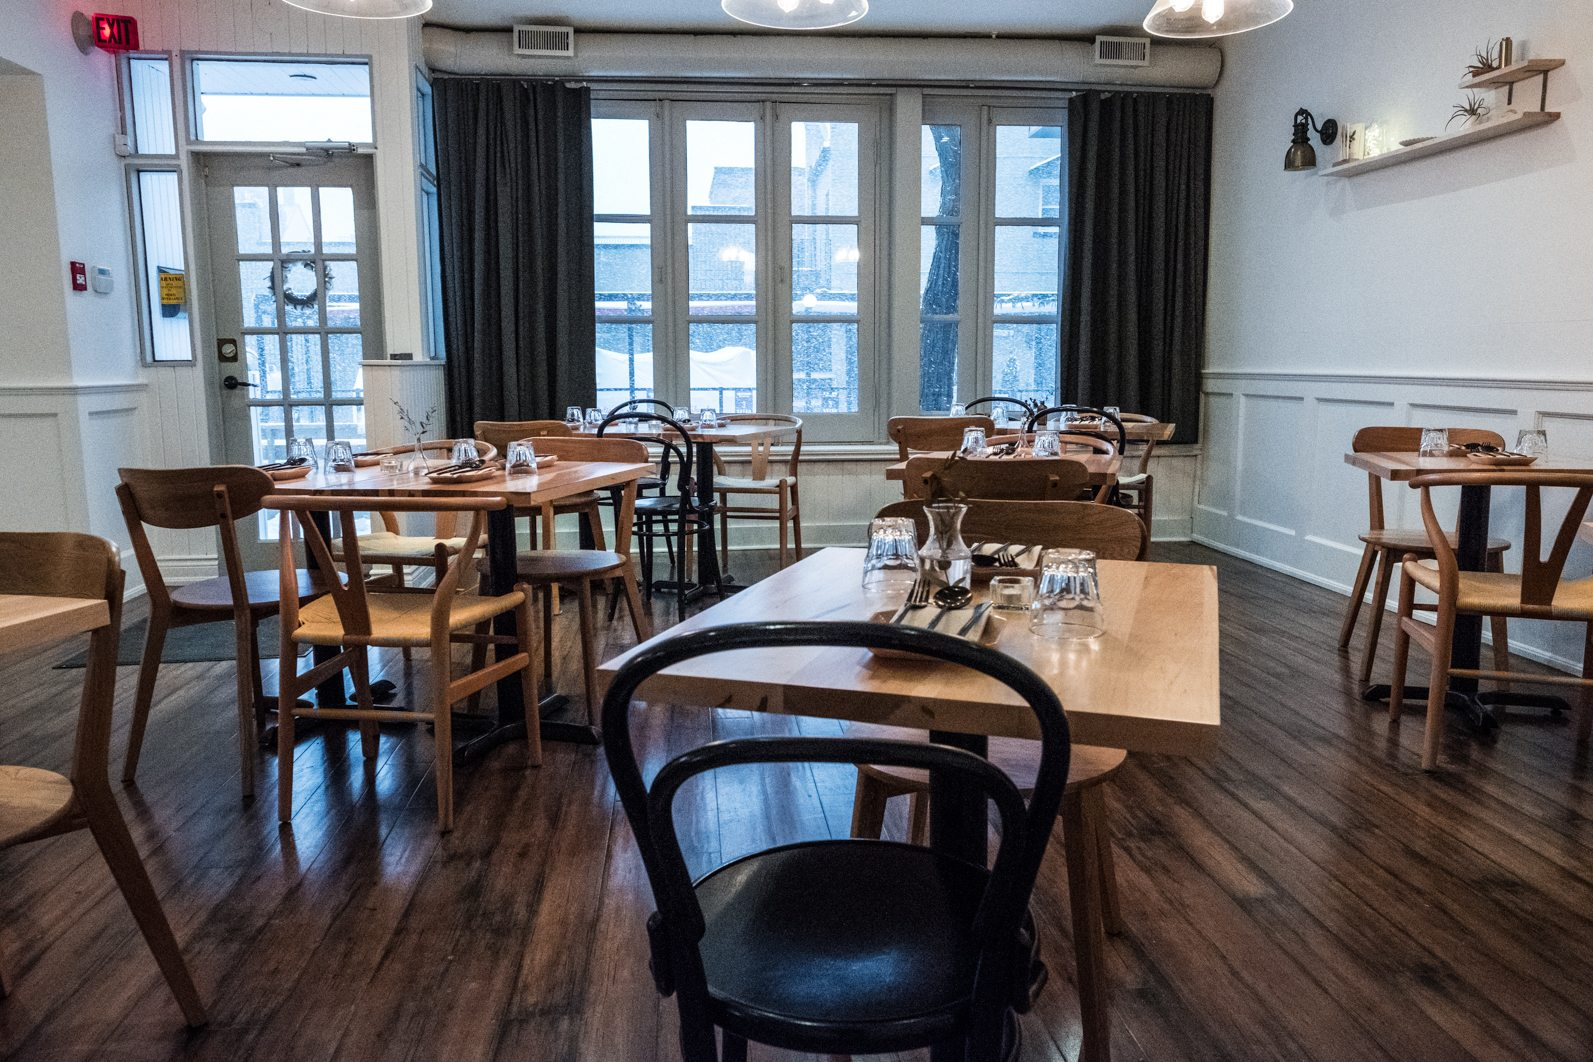 toronto-restaurants-doma-korean-french-little-italy-dining-room